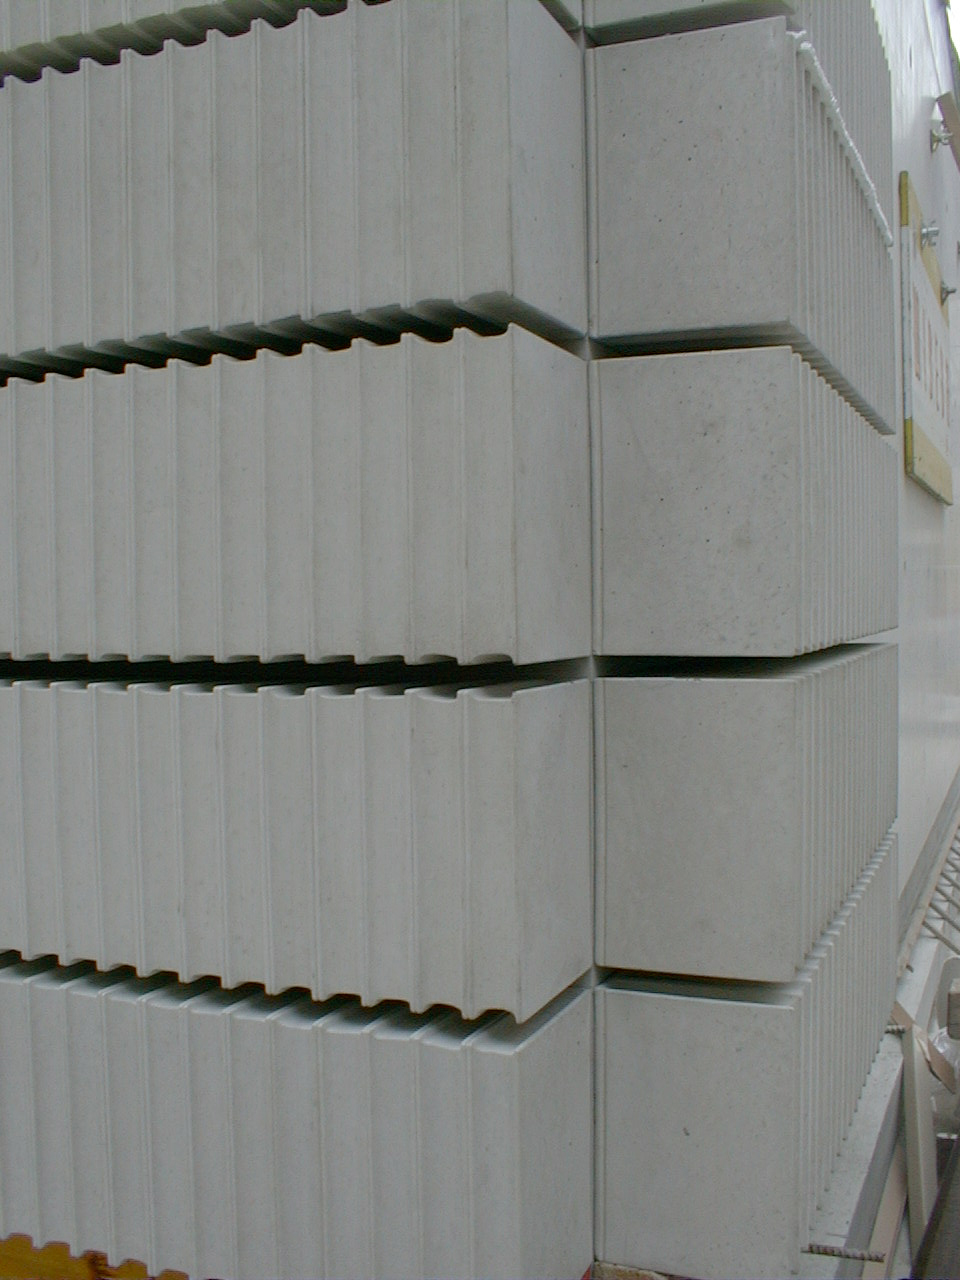 Rachel Whiteread, detail from   Holocaust Memorial   , 1995-2000  . Judenplatz, Vienna.   Mixed media  . 3.8 x 7 x 10 meters.